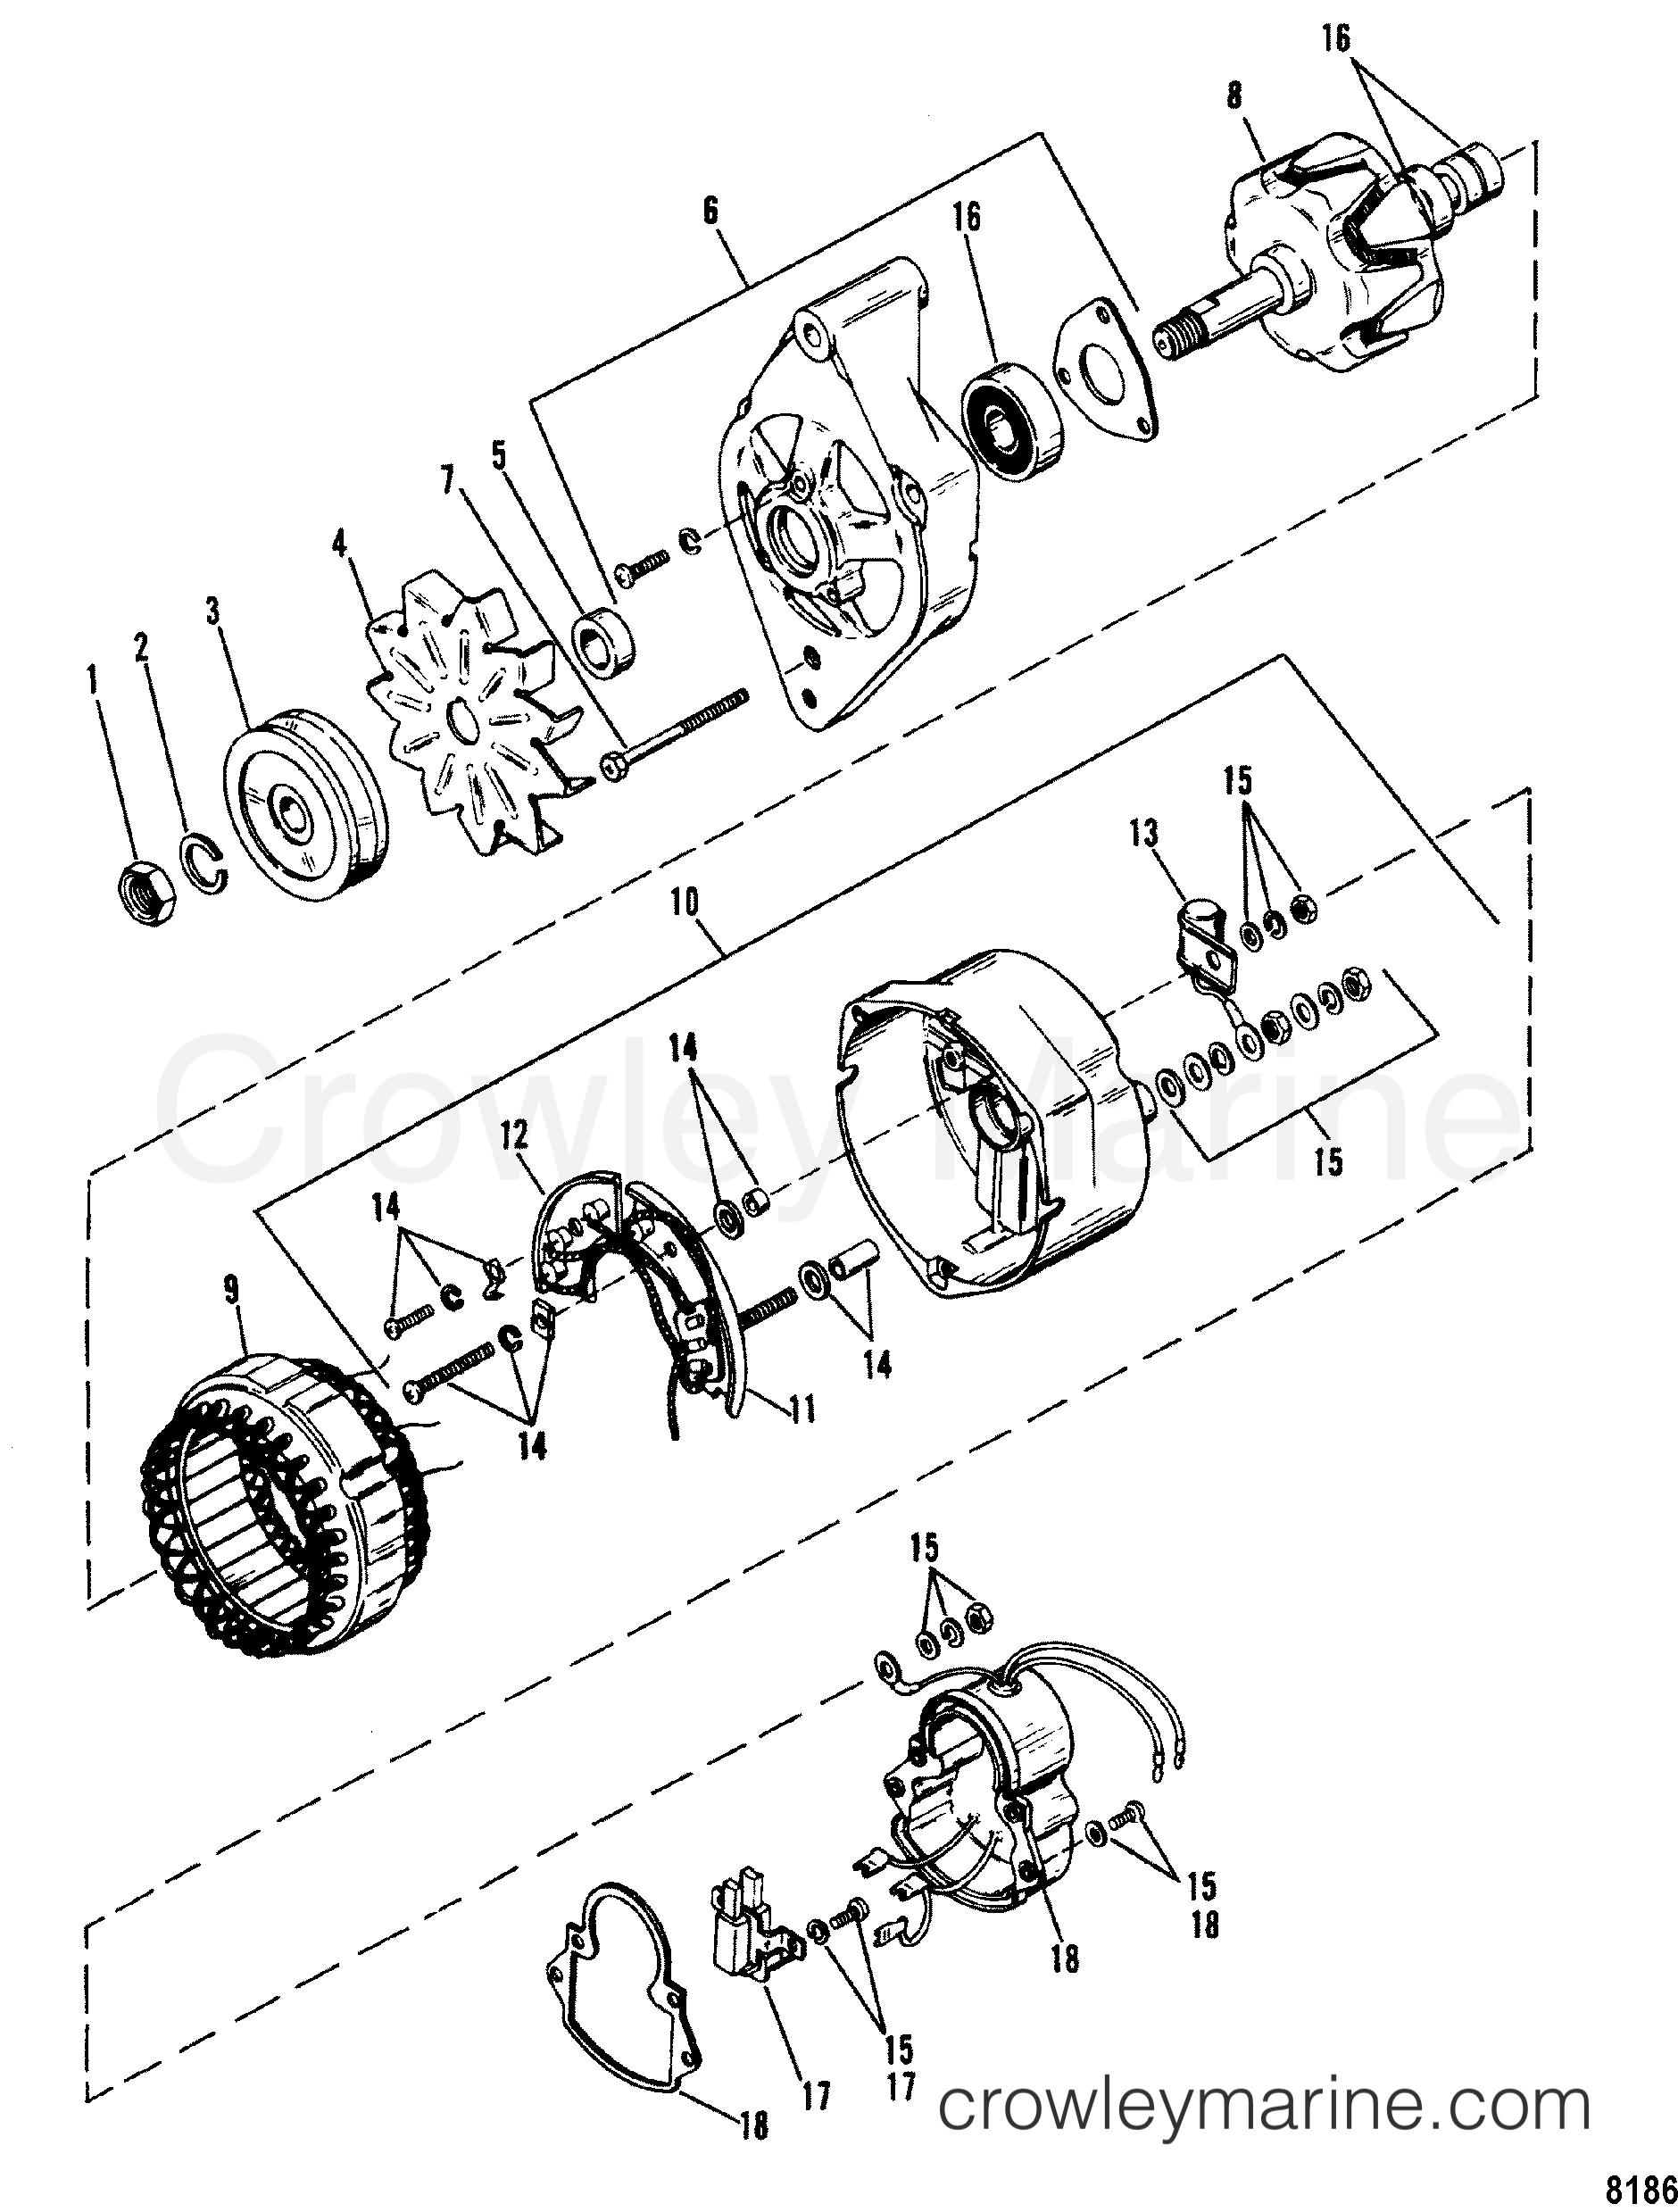 R00lVUxe alternator(mando) ar 150 1992 mercury inboard engine 7 4l